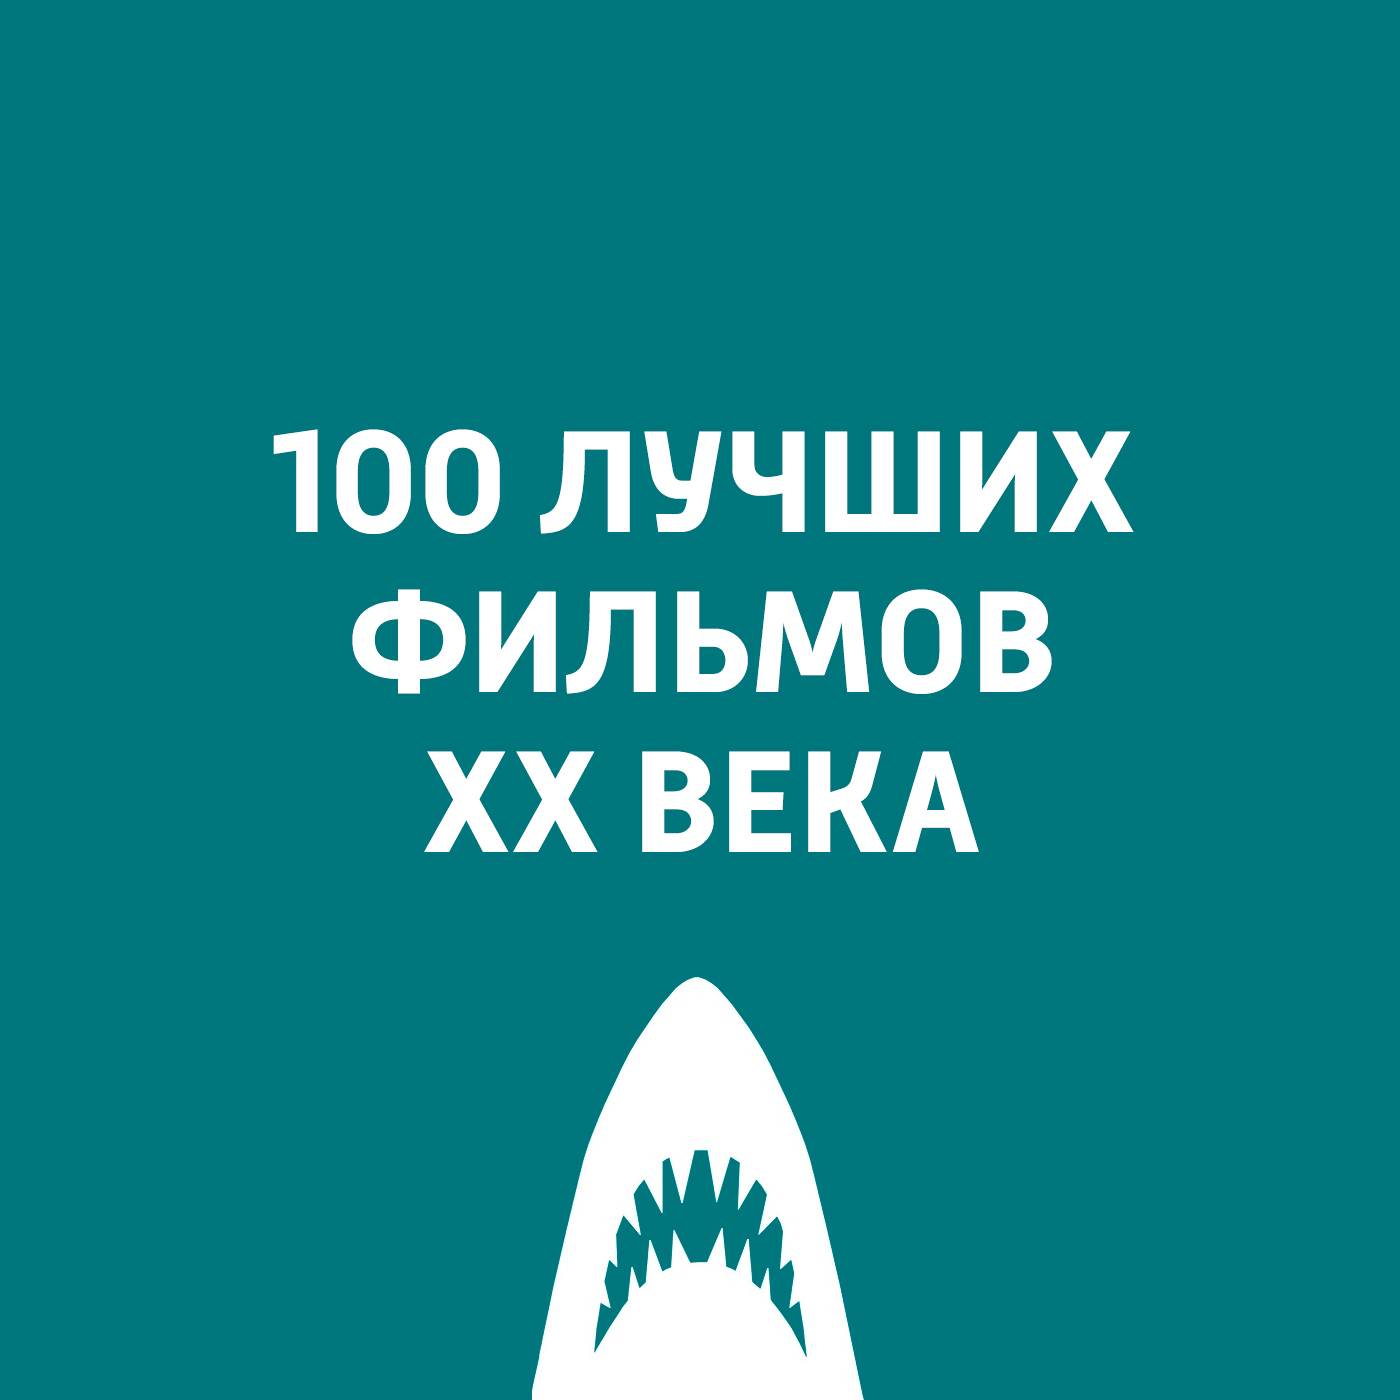 Антон Долин Хрусталёв, машину! гакк машину